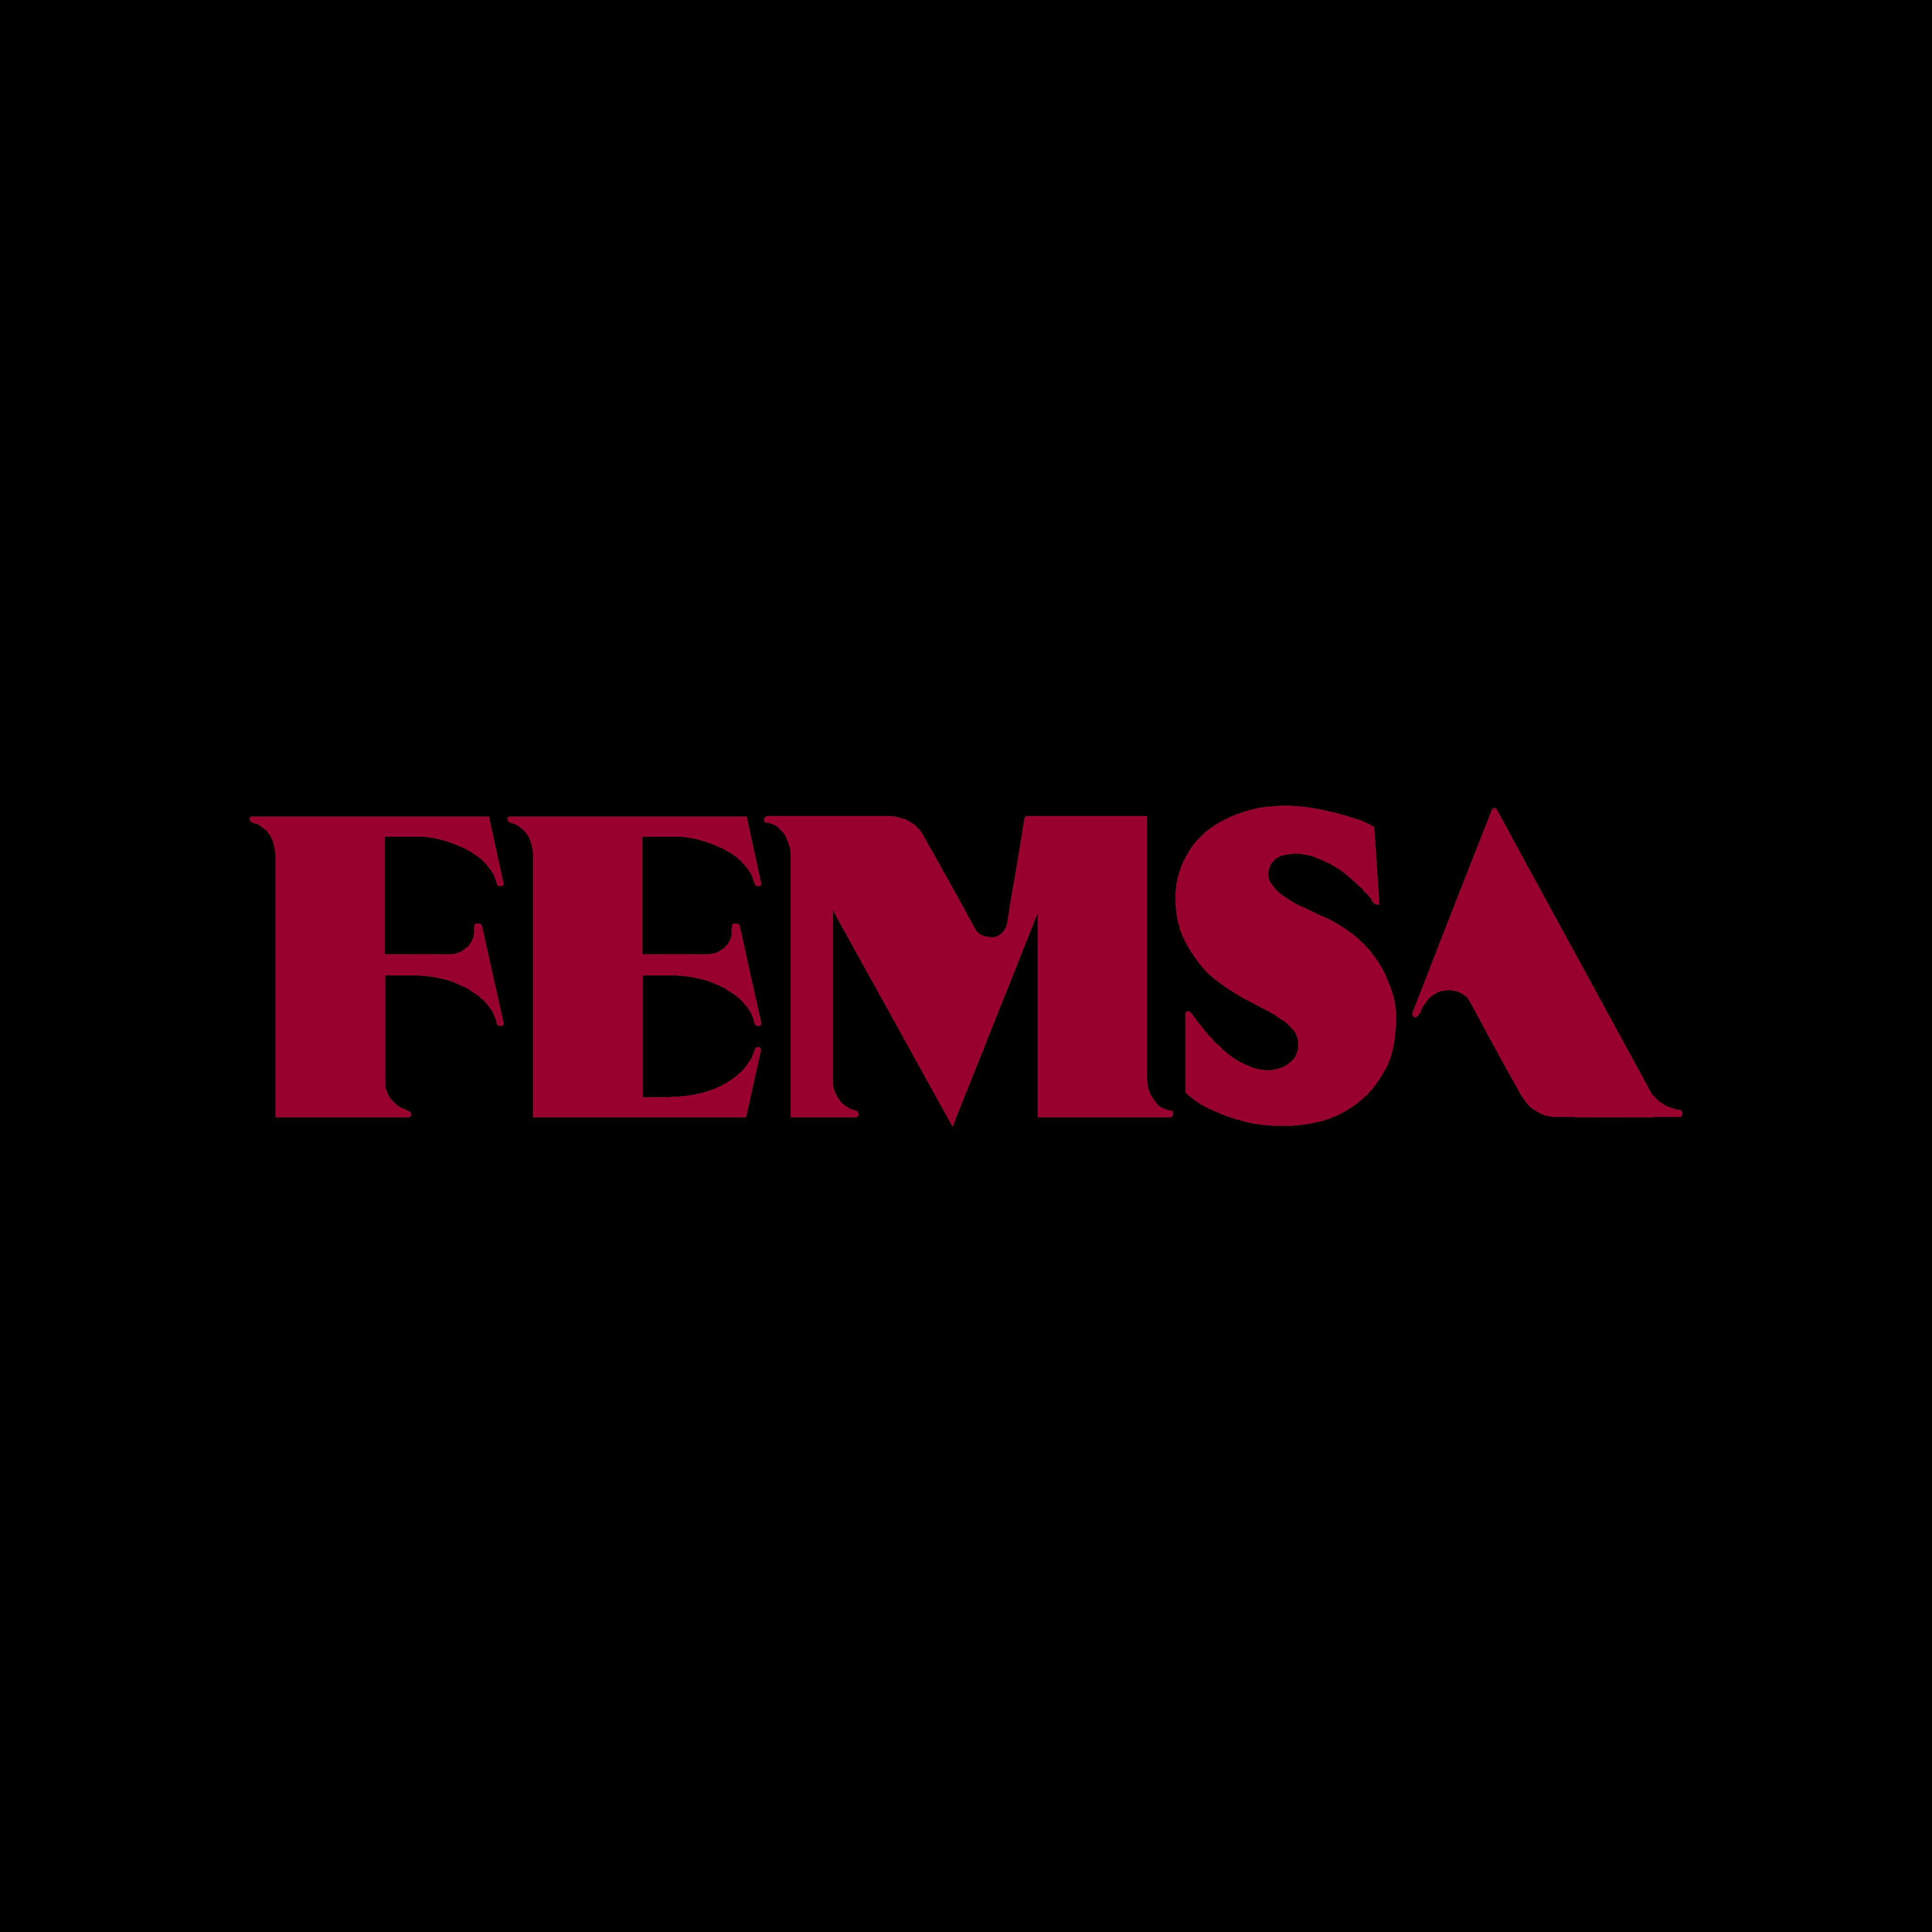 FEMSA Logo PNG.